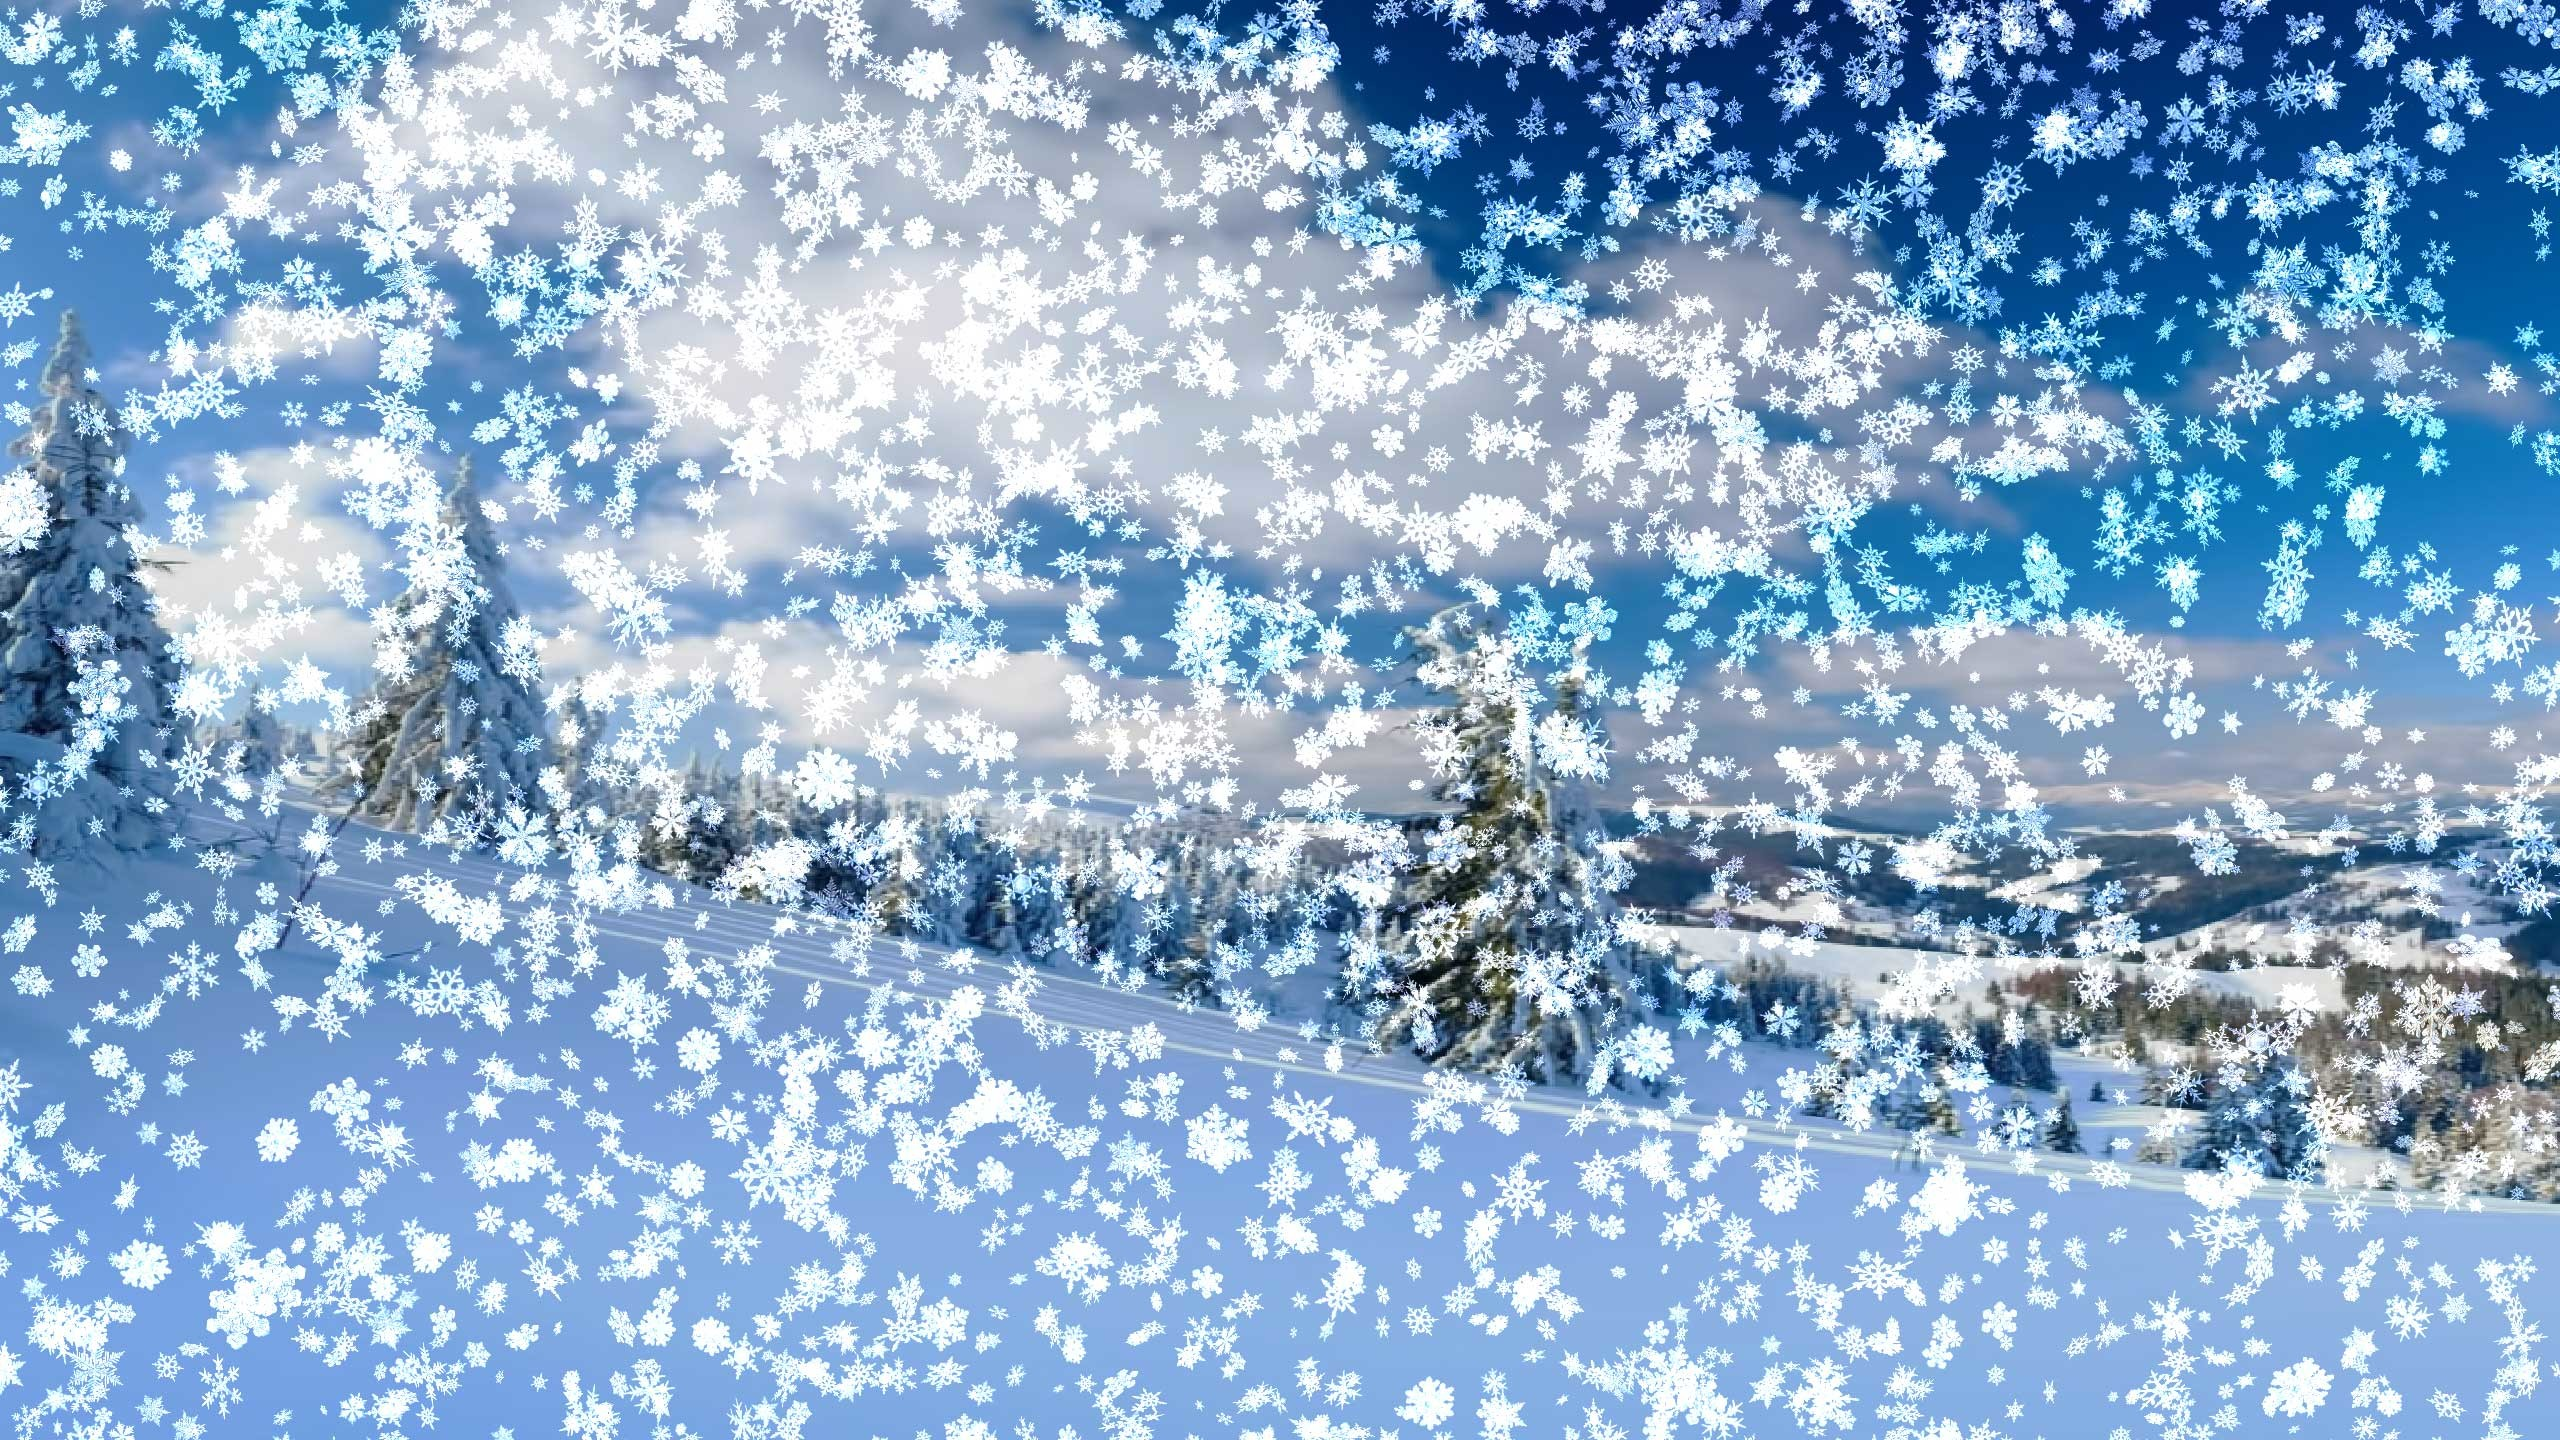 Sakura Falling Live Wallpaper Downloads Live Snow Falling Wallpaper 54 Images